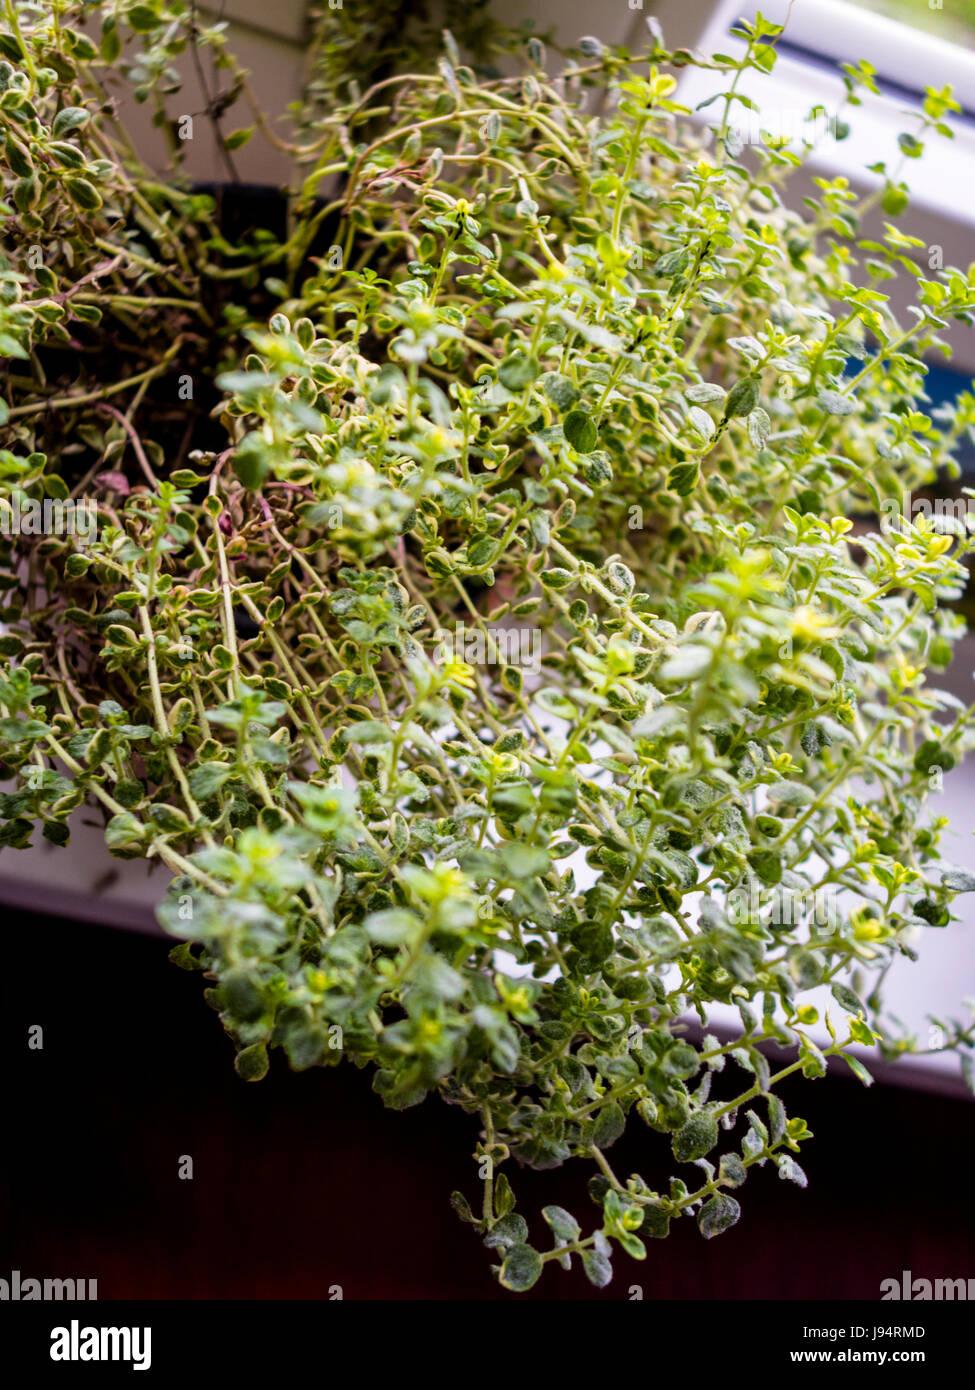 Fresh Thyme - Stock Image